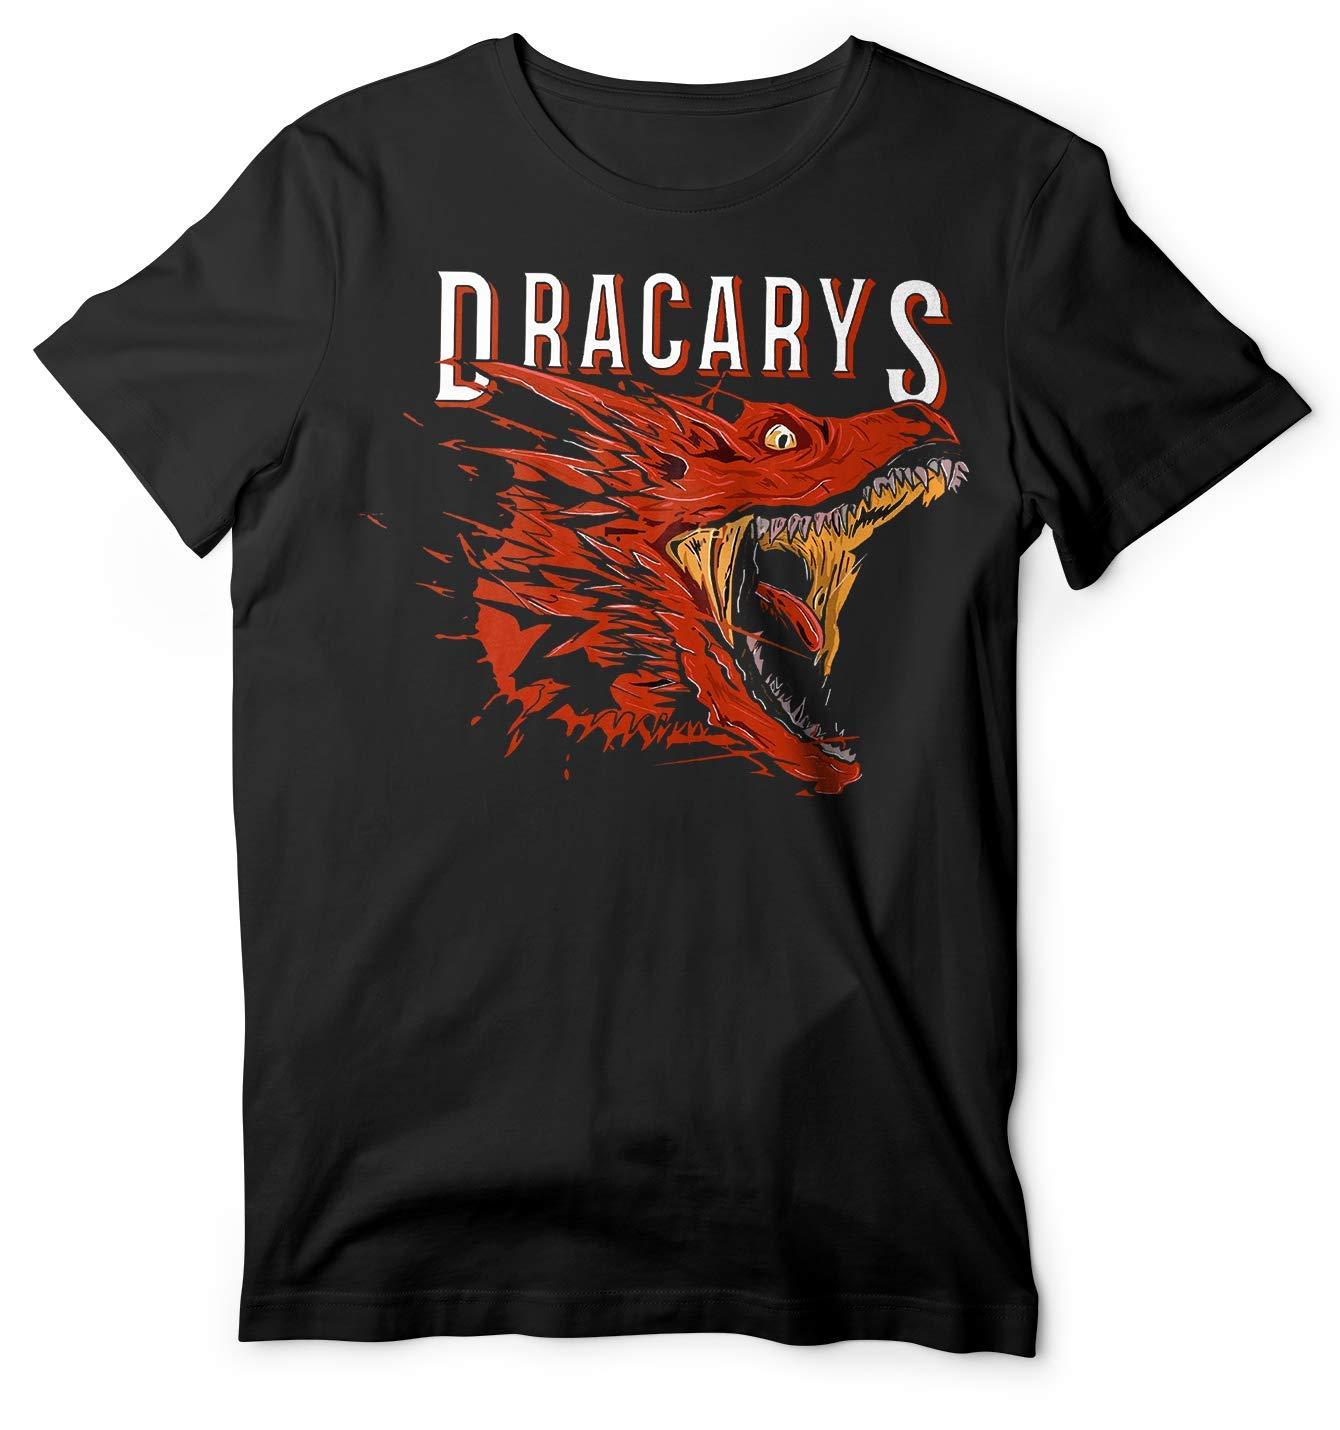 Dracarys Shirt Mother Of Dragons Khaleesi Shirt Dragon Fire 2361